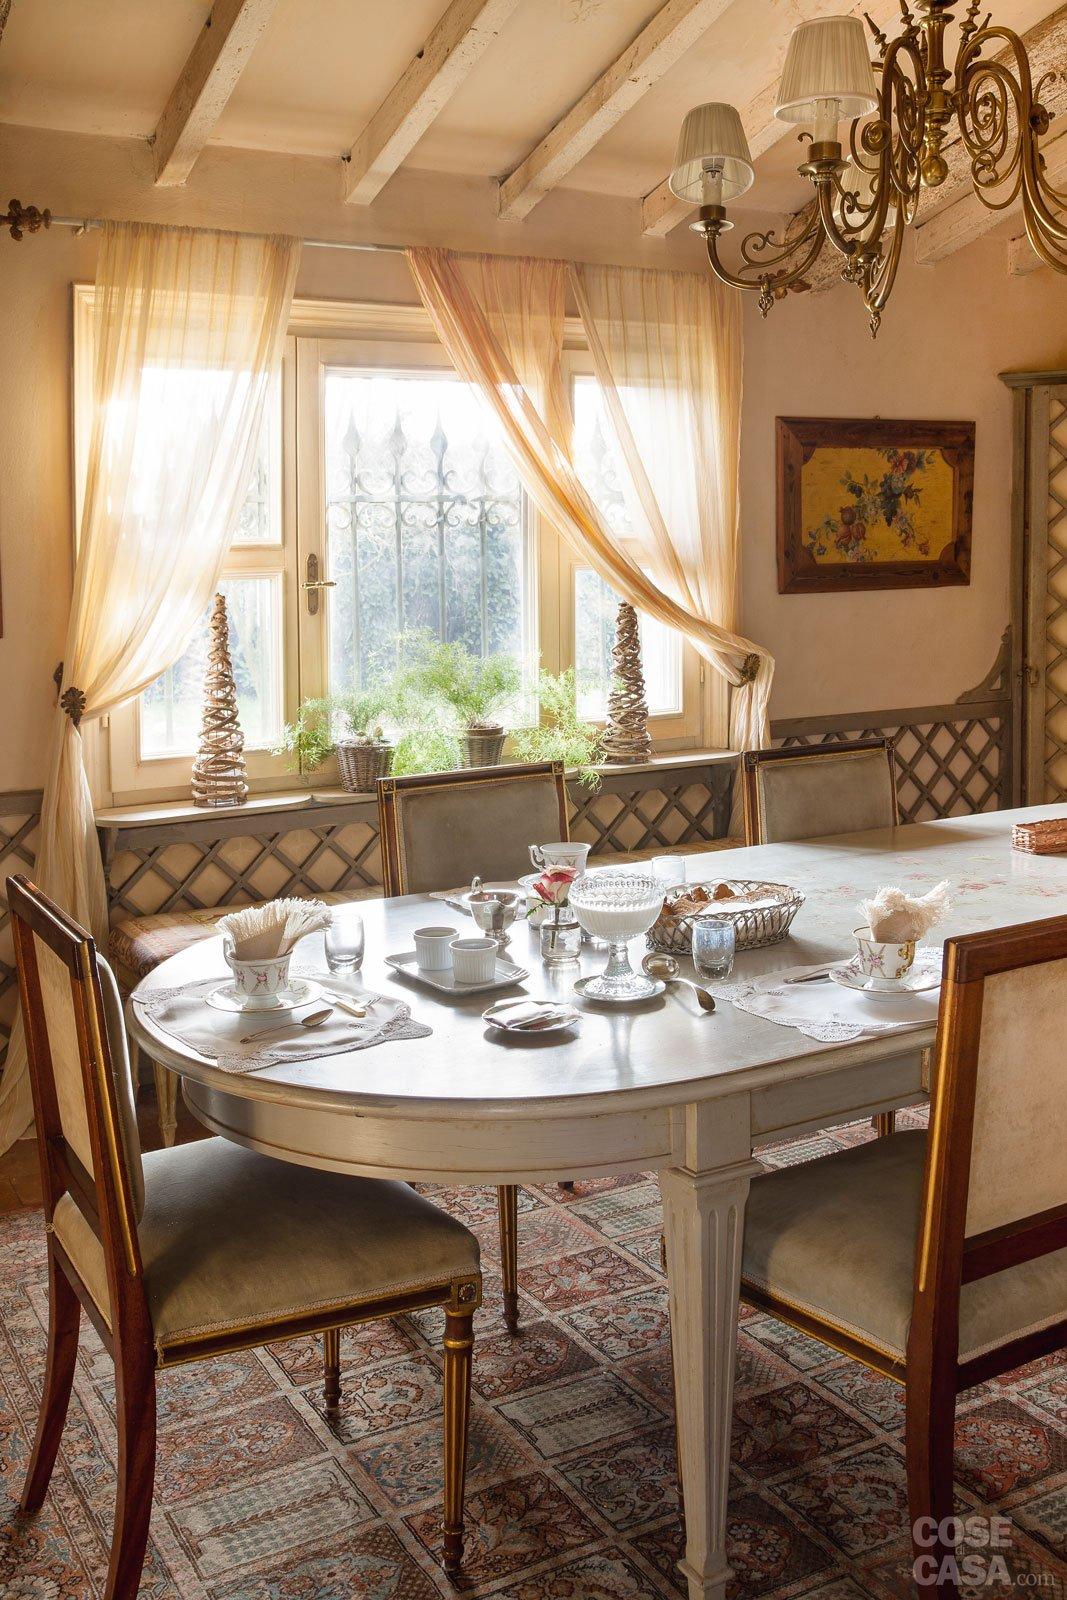 Colori Per Interni Casa Rustica da cascina a casa chic con travi a vista e soffitti